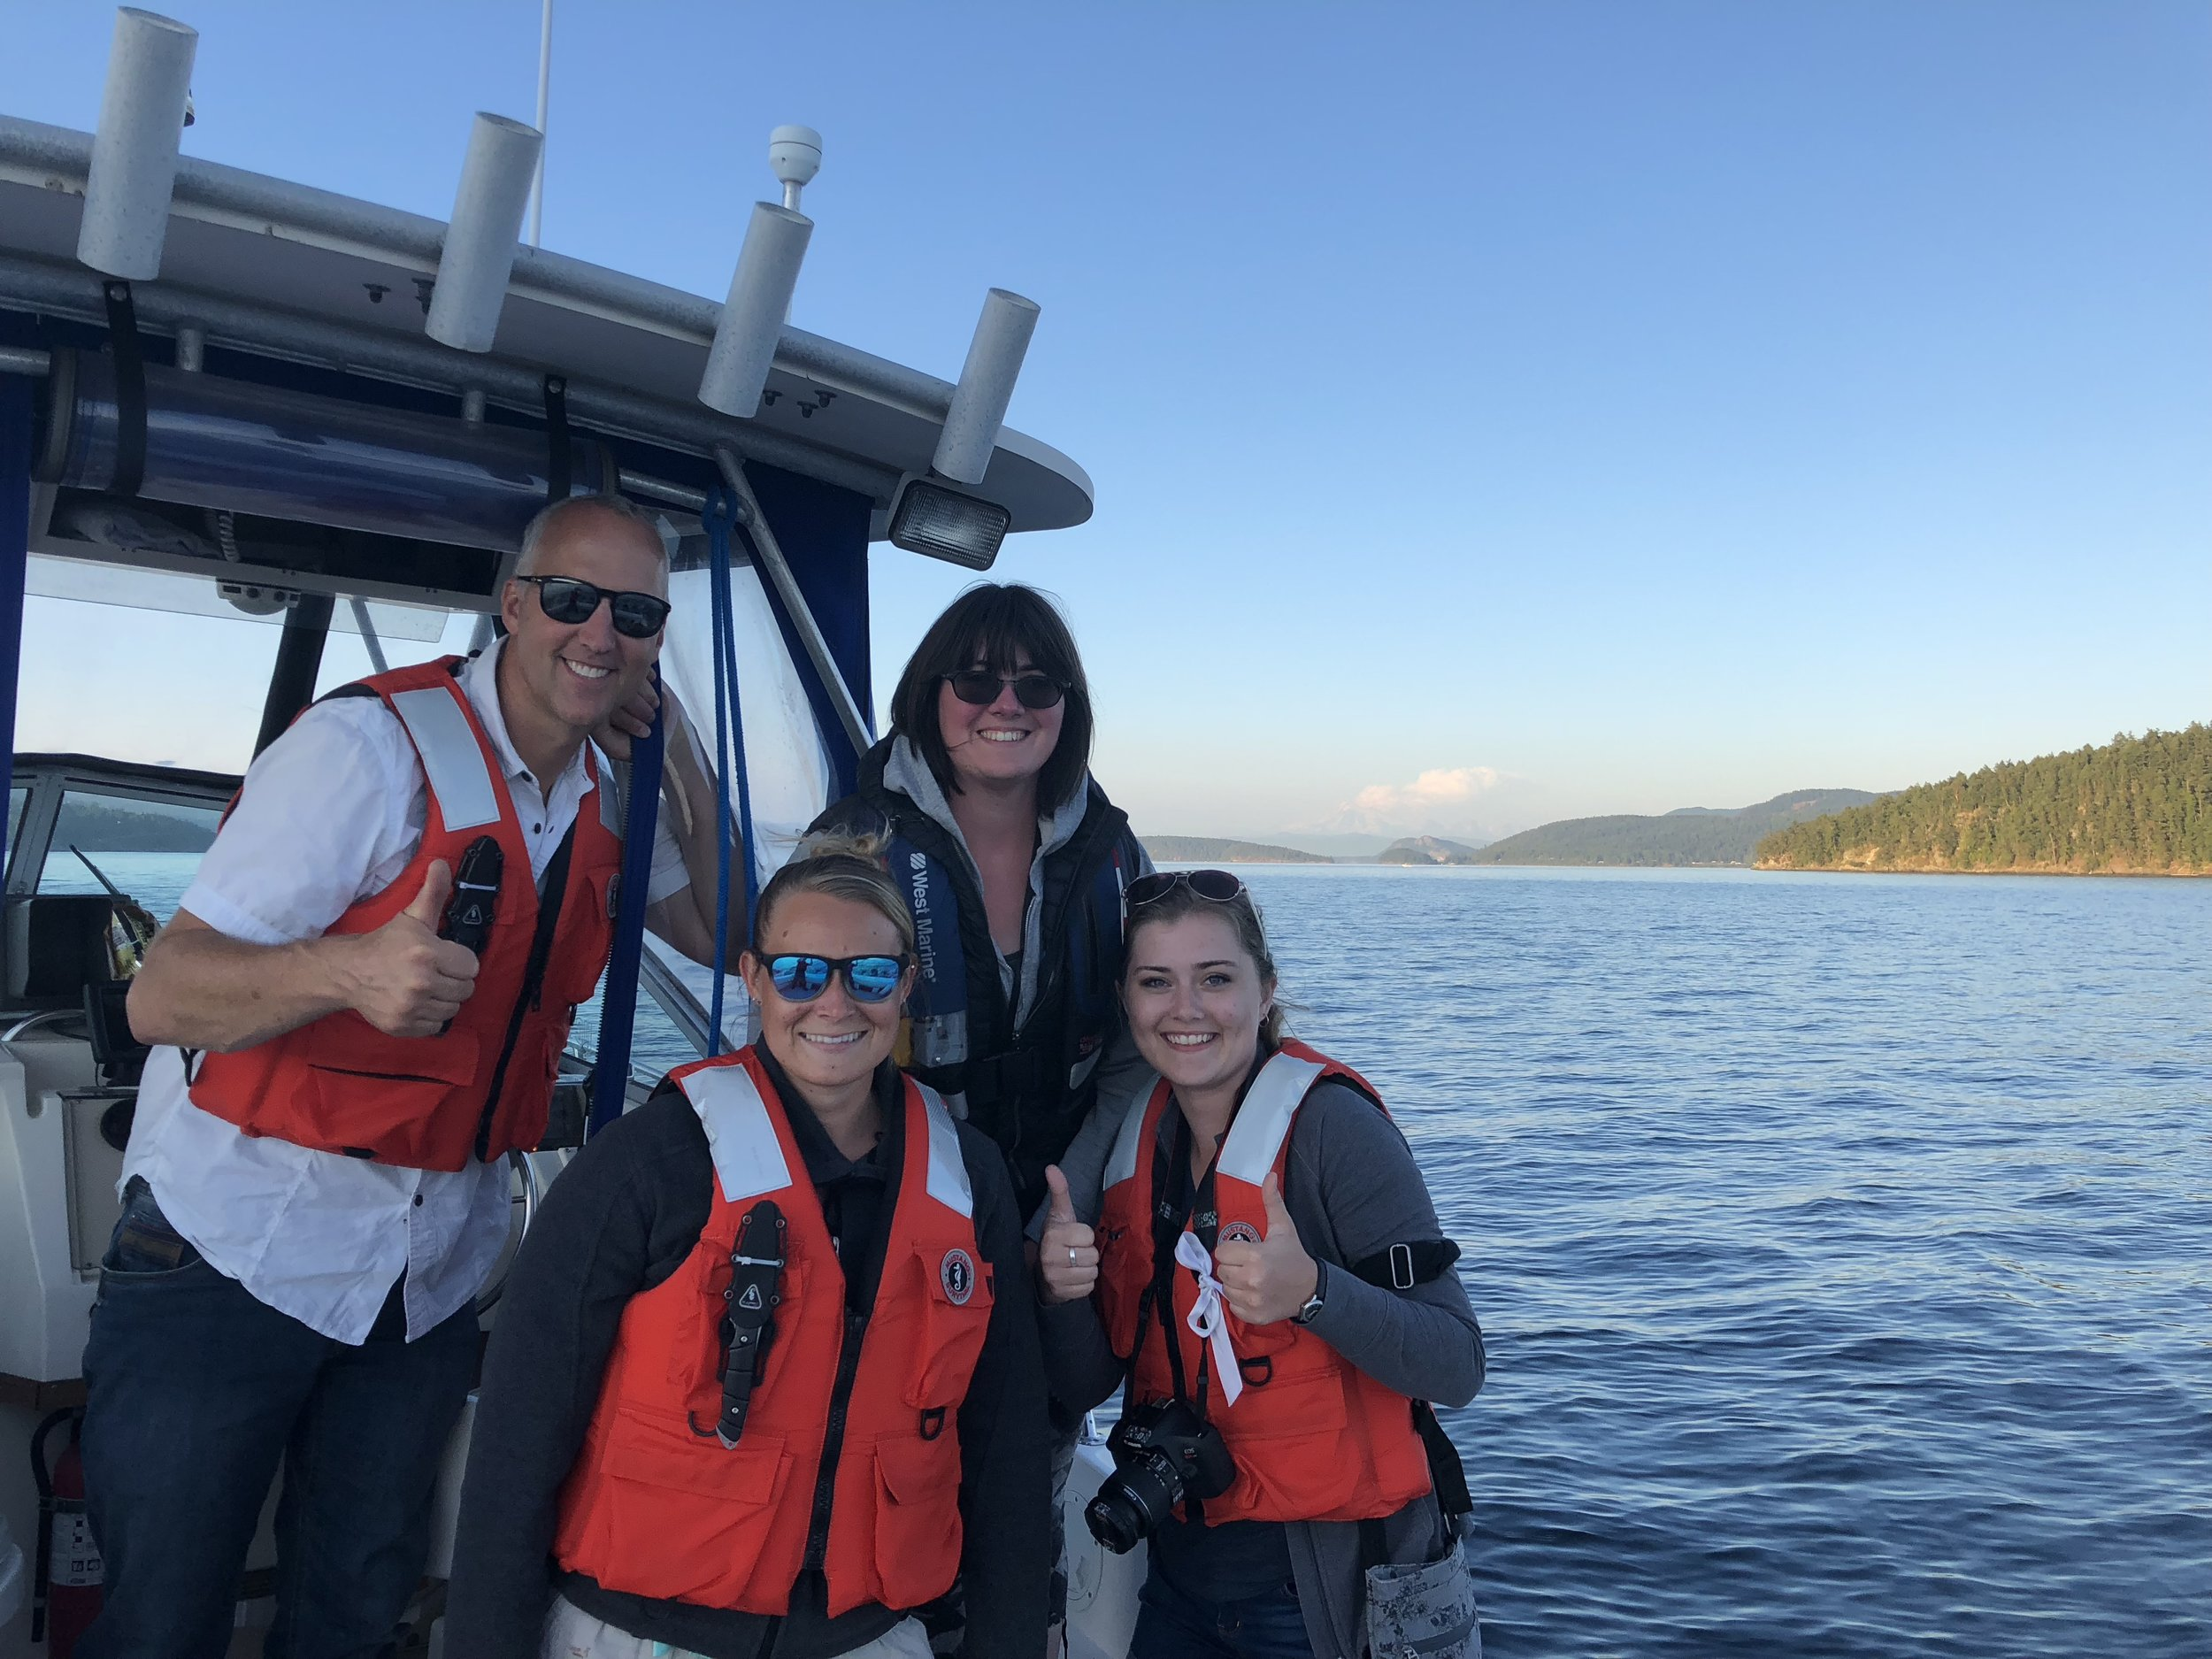 Left to right: Joe Gaydos,Alexa Dickson, Tamsen Polley, and Lauren Mathis aboard the Molly B.